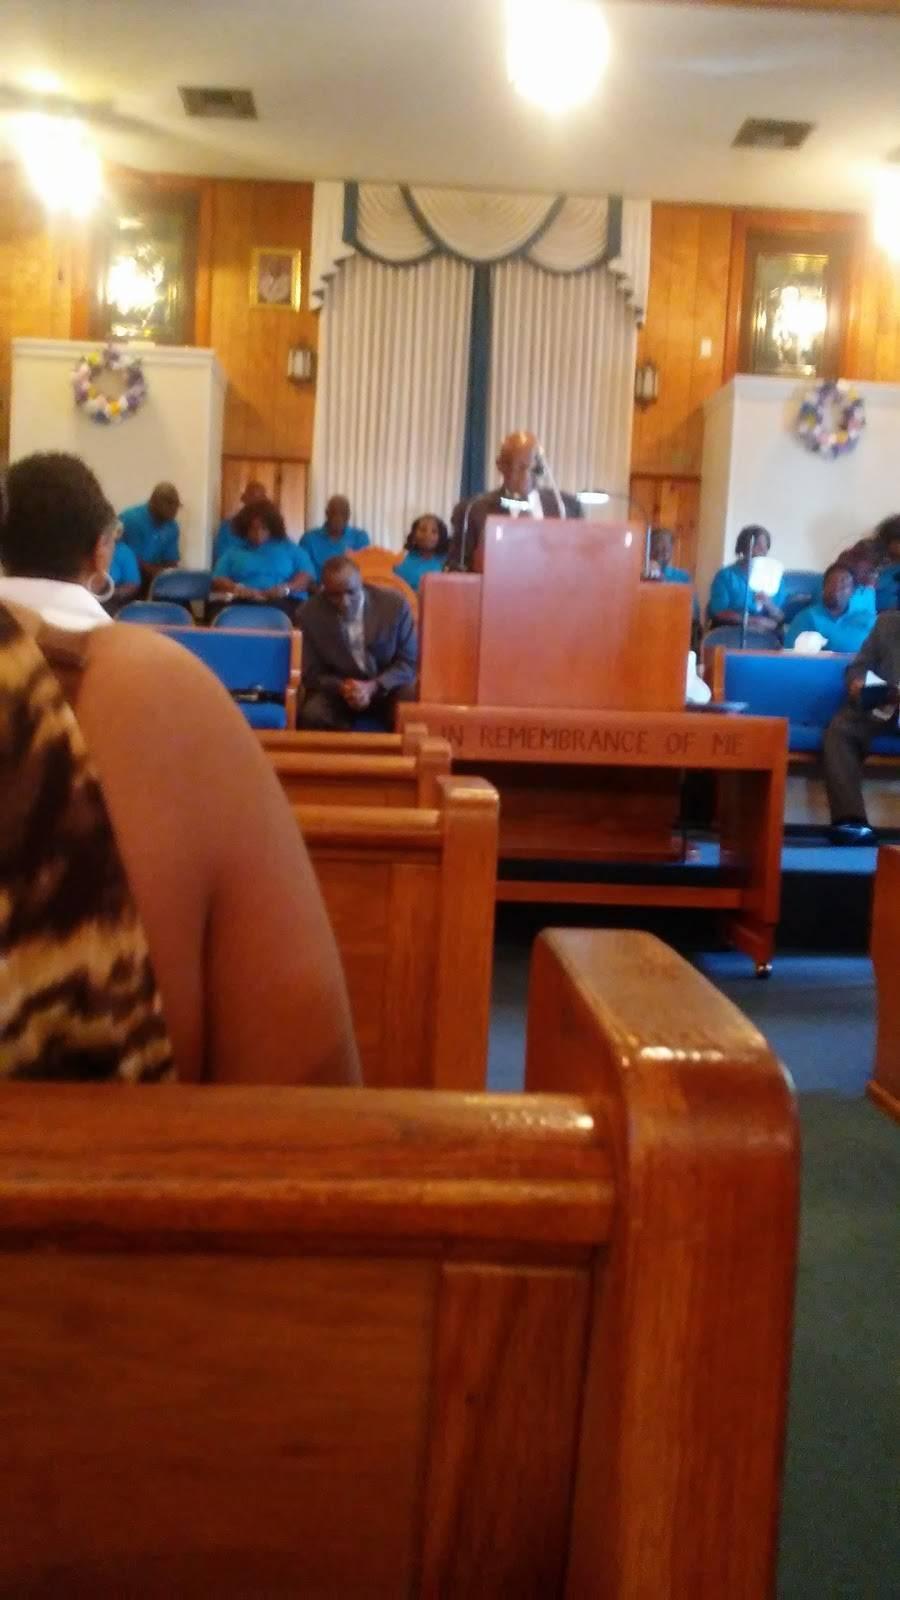 Mt Sinai Baptist Church - church    Photo 9 of 9   Address: 1249 Leboeuf St, New Orleans, LA 70114, USA   Phone: (504) 366-7643